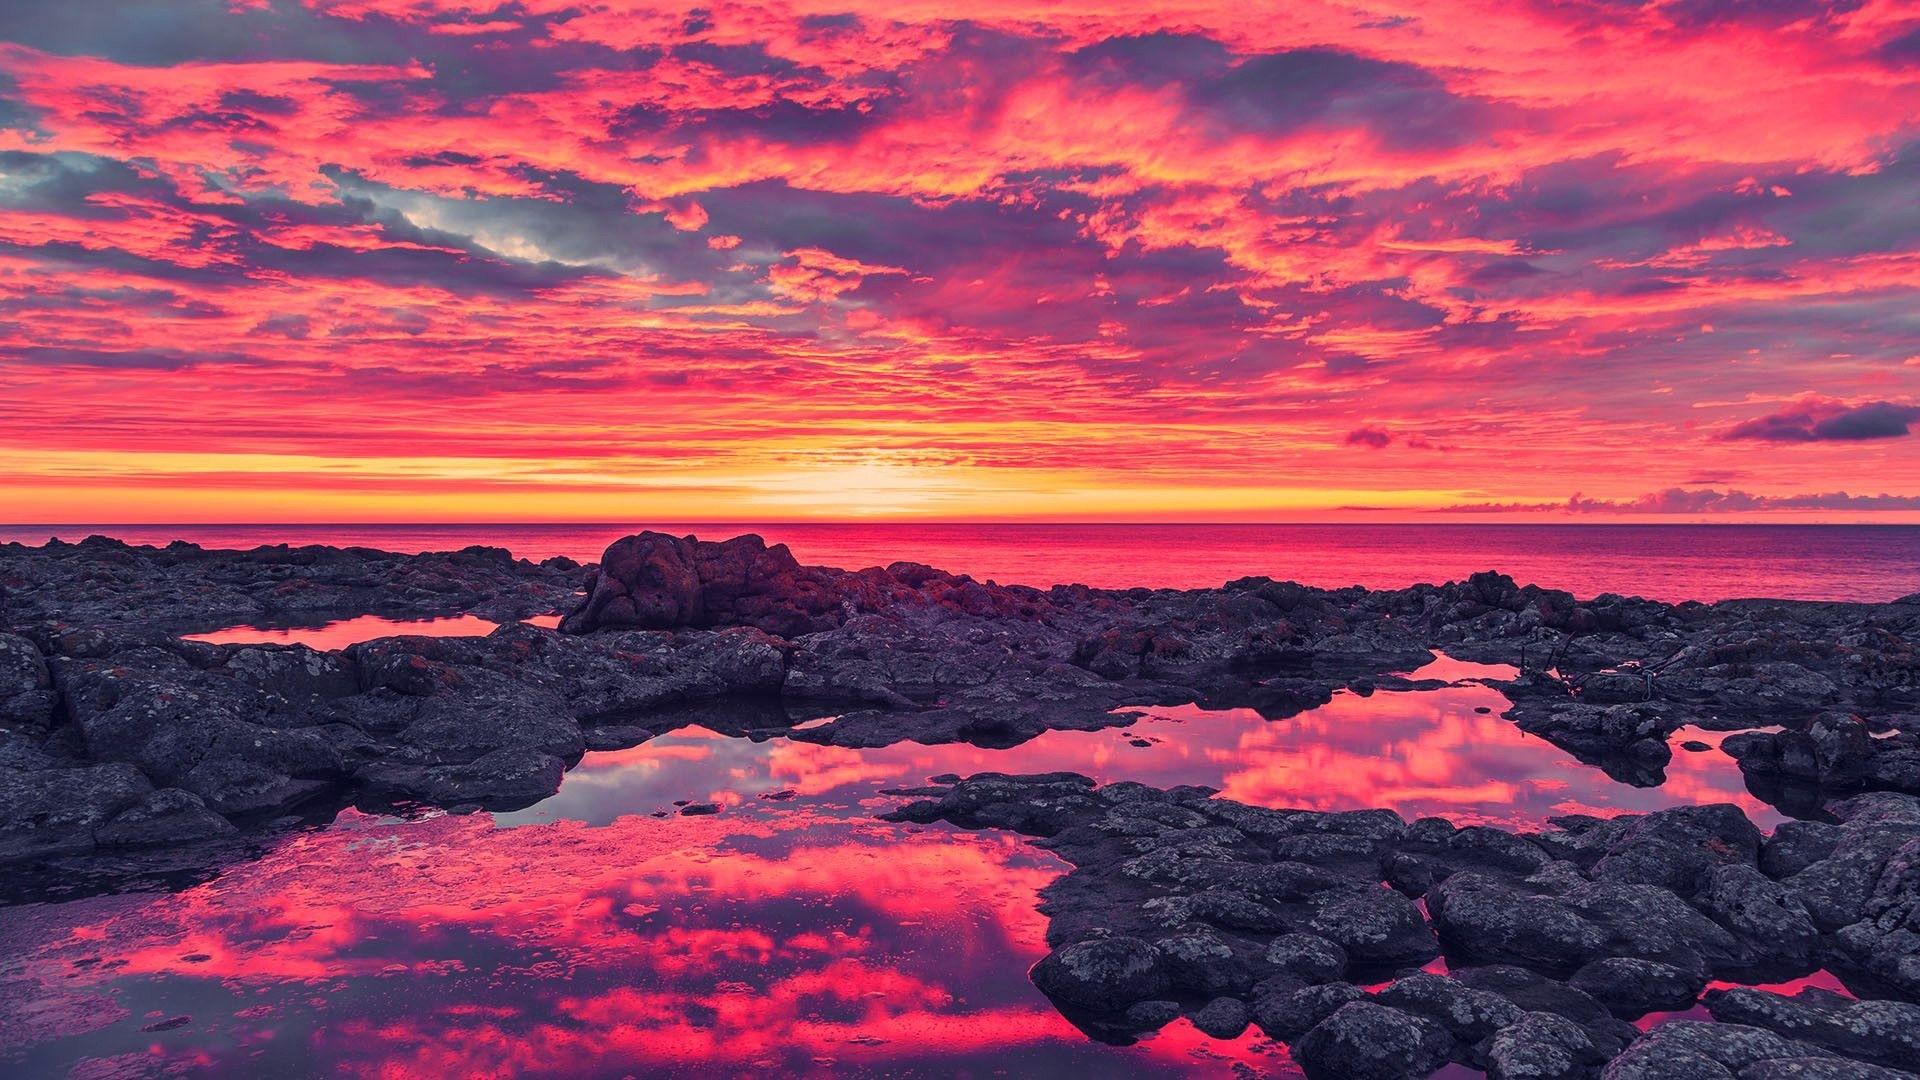 Pink Sunset hd wallpaper download